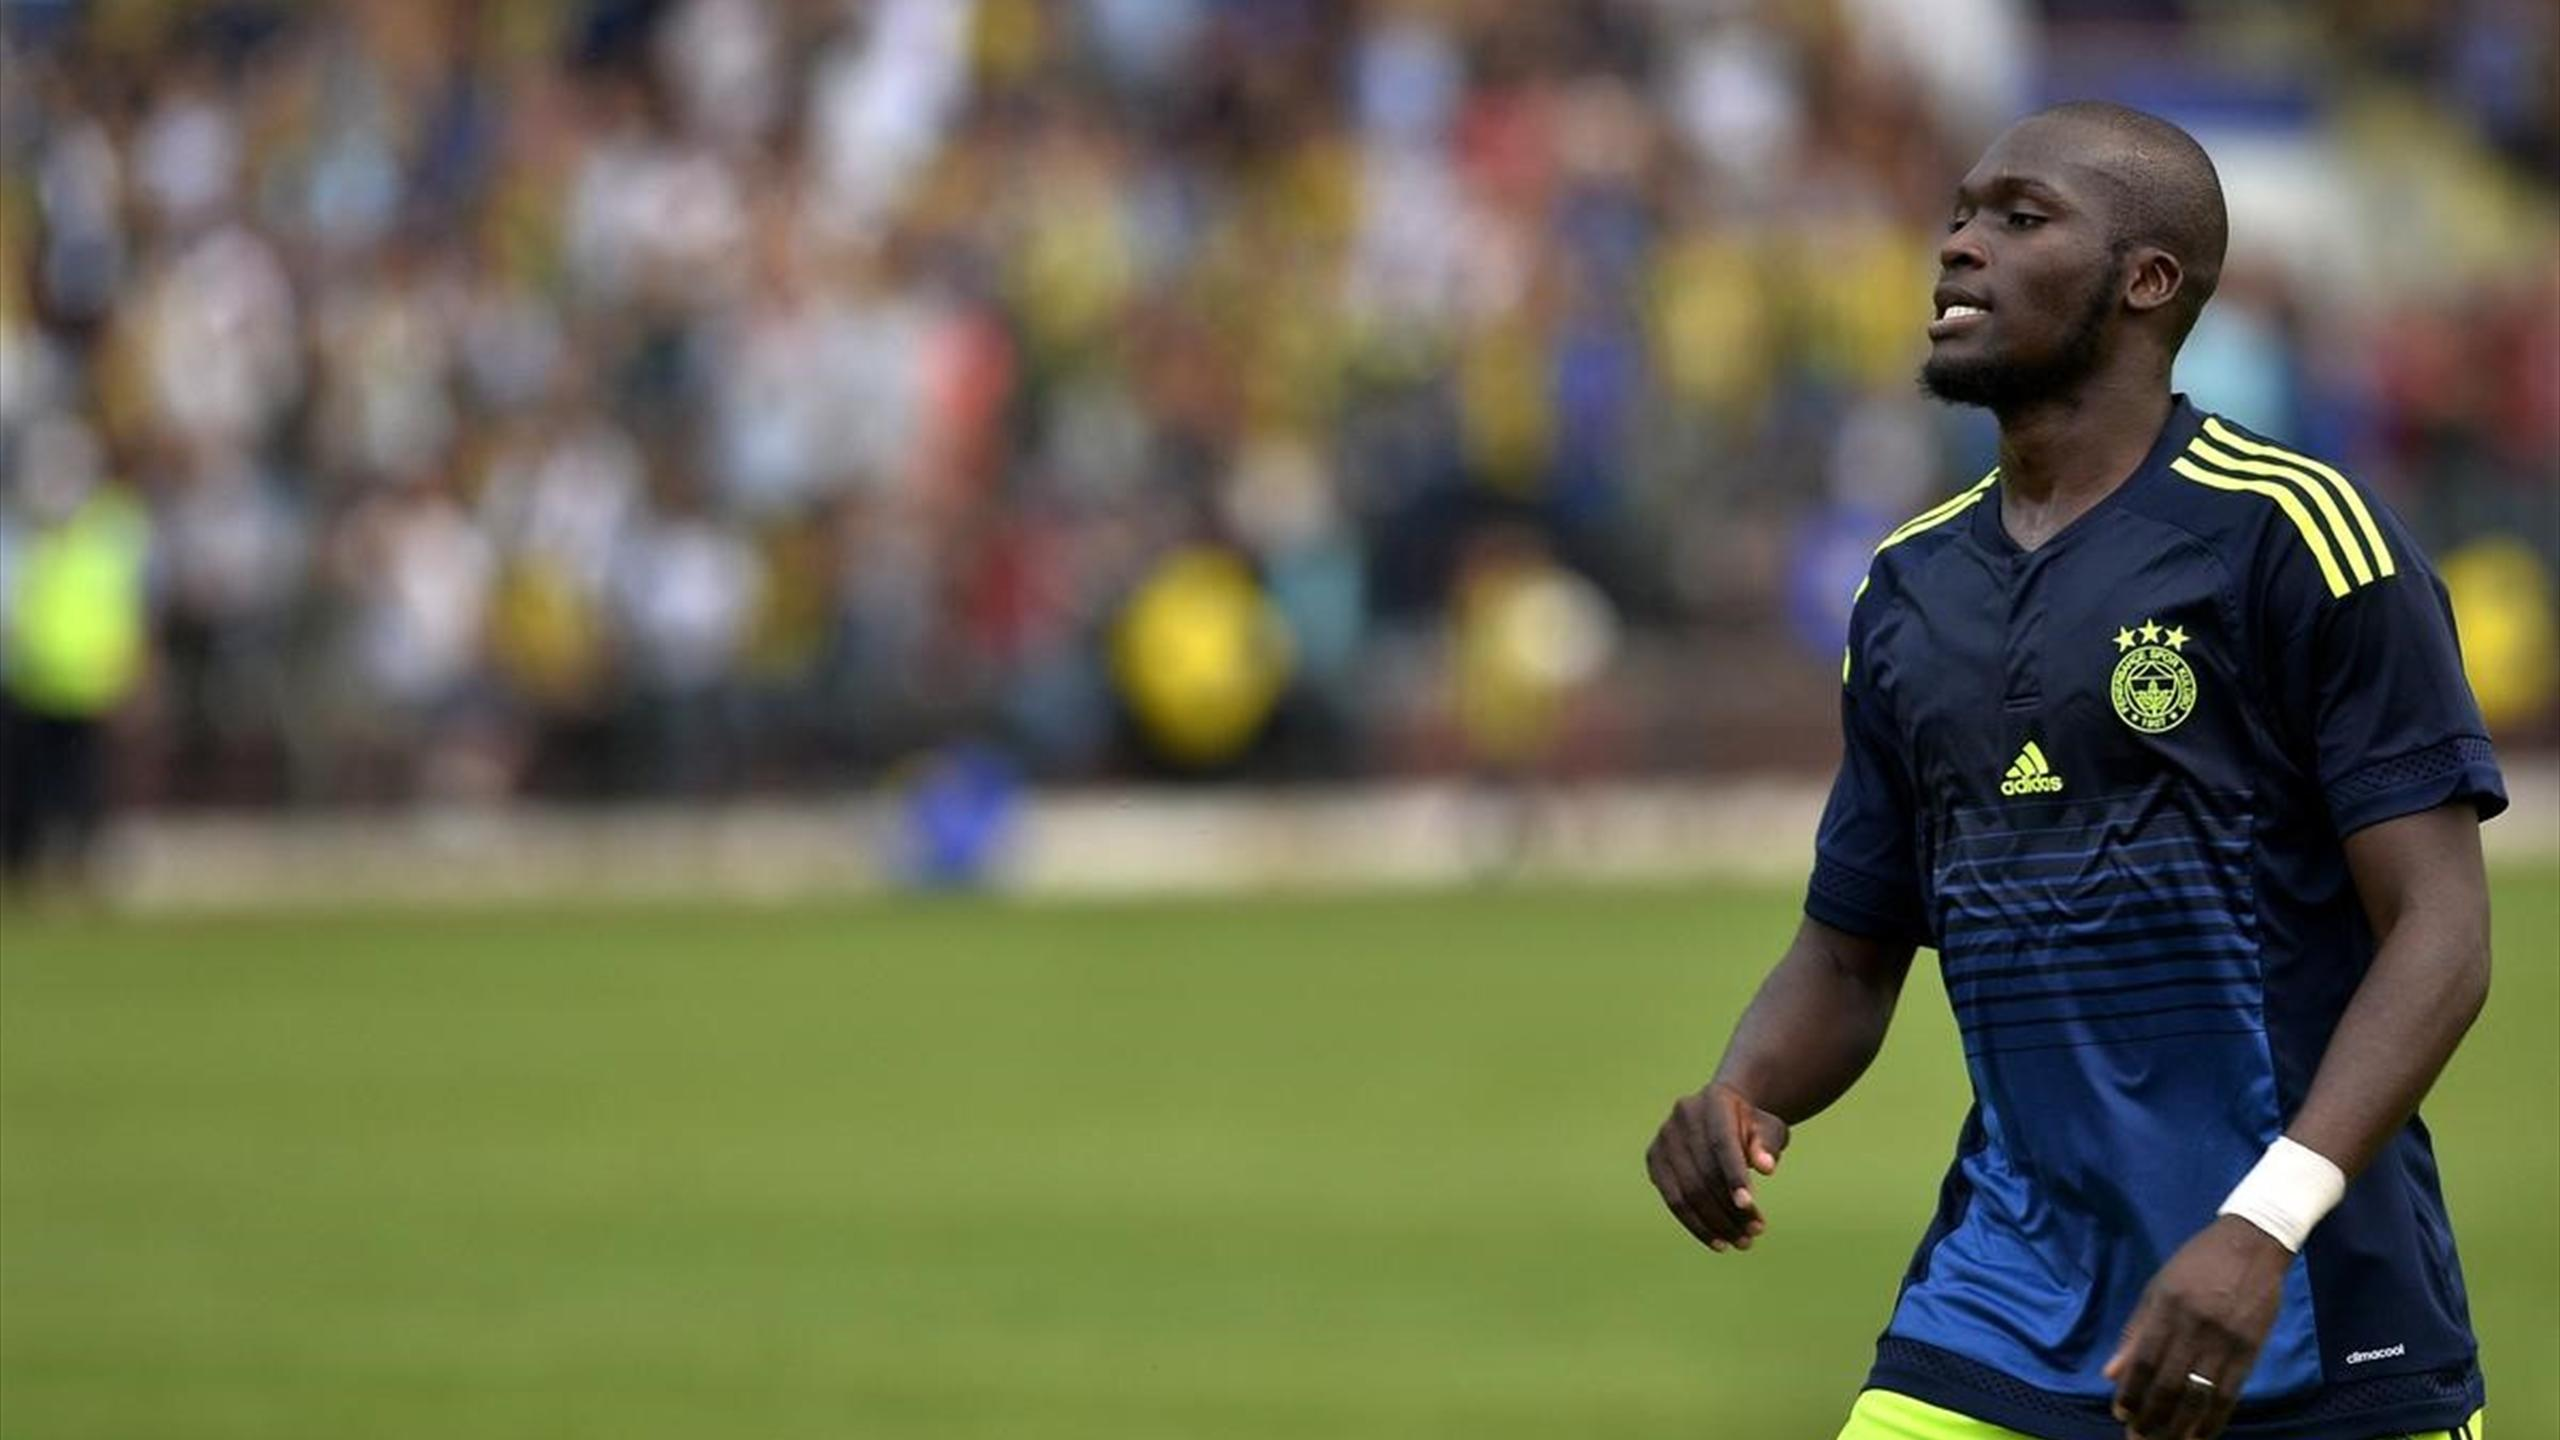 Moussa Sow, Fenerbahçe